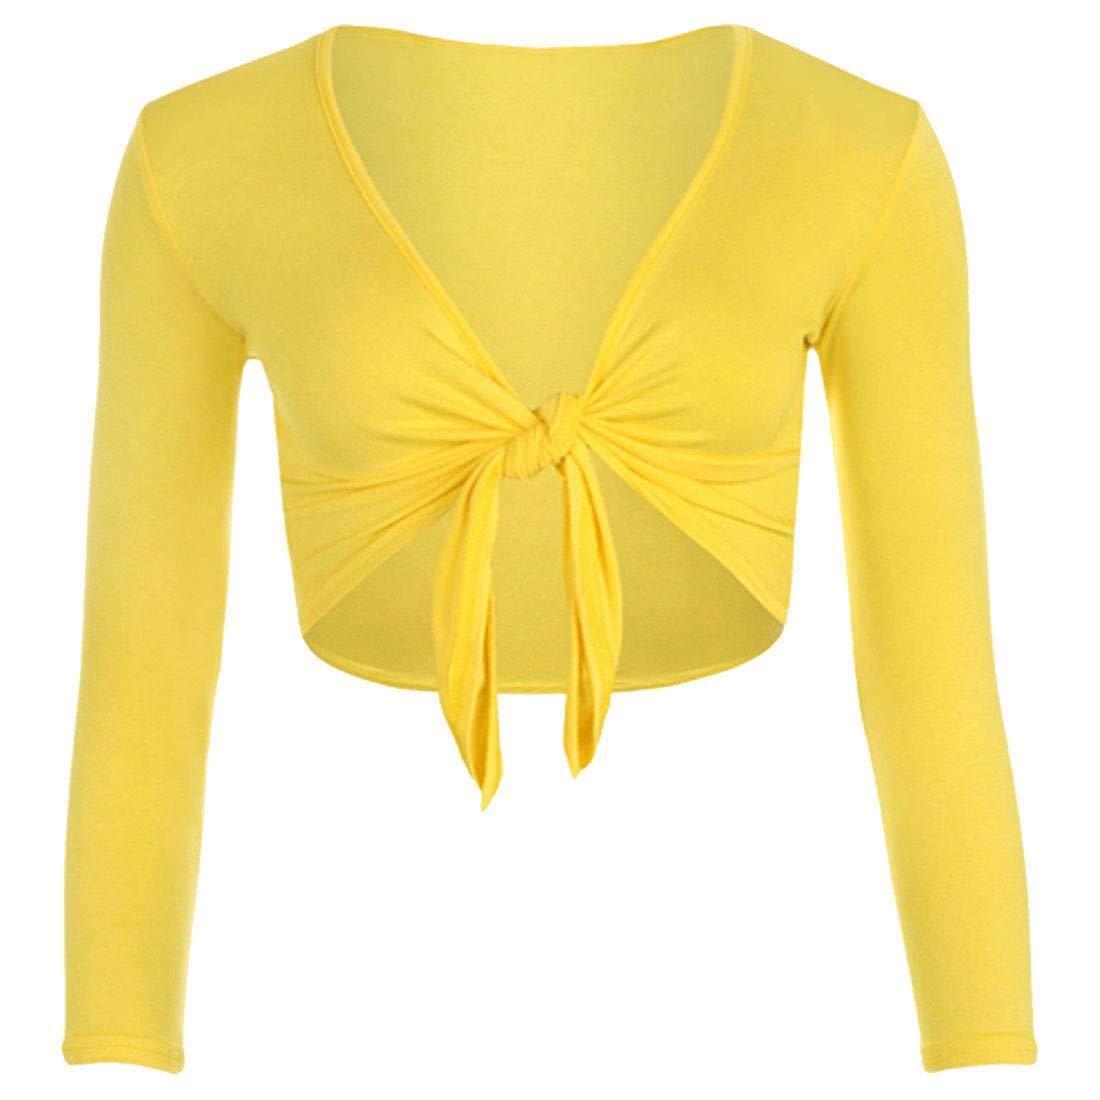 FASHION FAIRIES Ladies Womens Plain Long Sleeve Tie up Front Cropped Shrug Bolero Cardigan Top